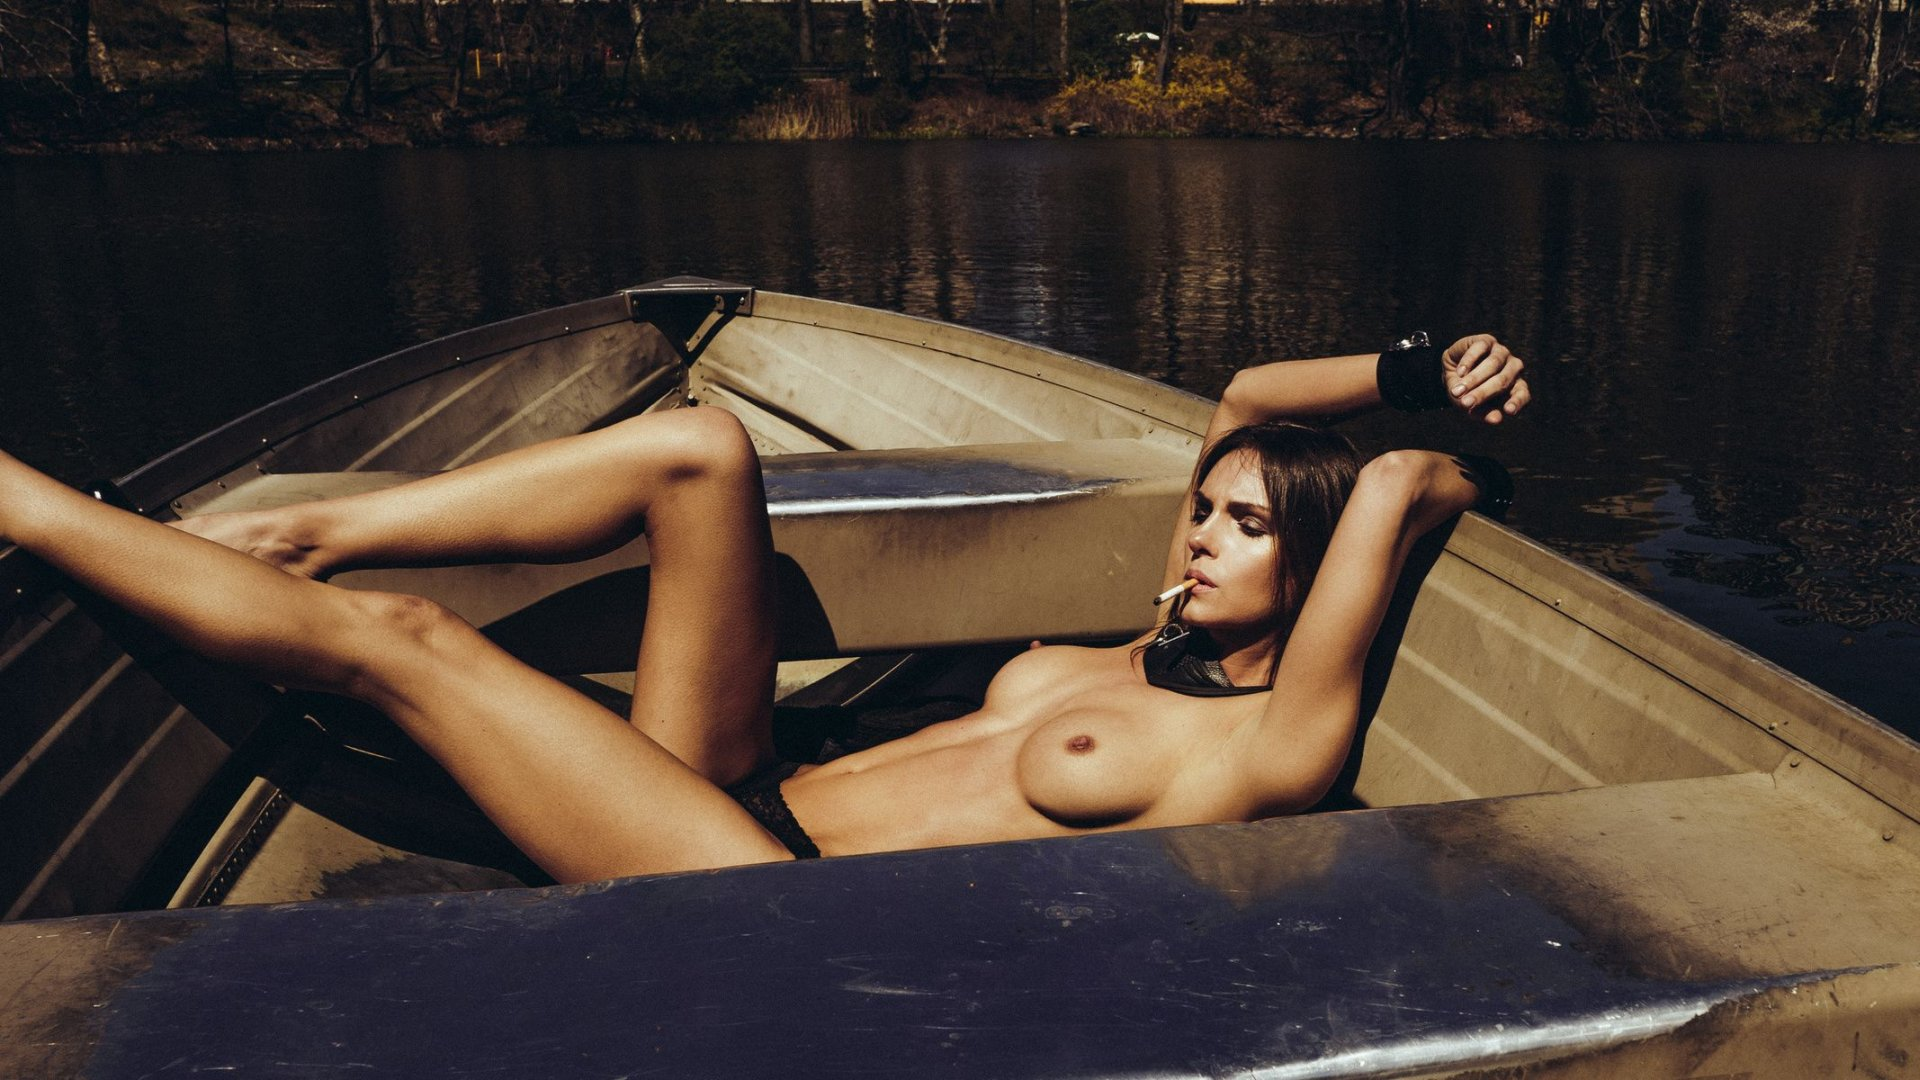 Hilary rhoda butt,Emily osment out bowling with friends Porn nude VIDEO Josefien Rodermans,Dorit kemsley 2019